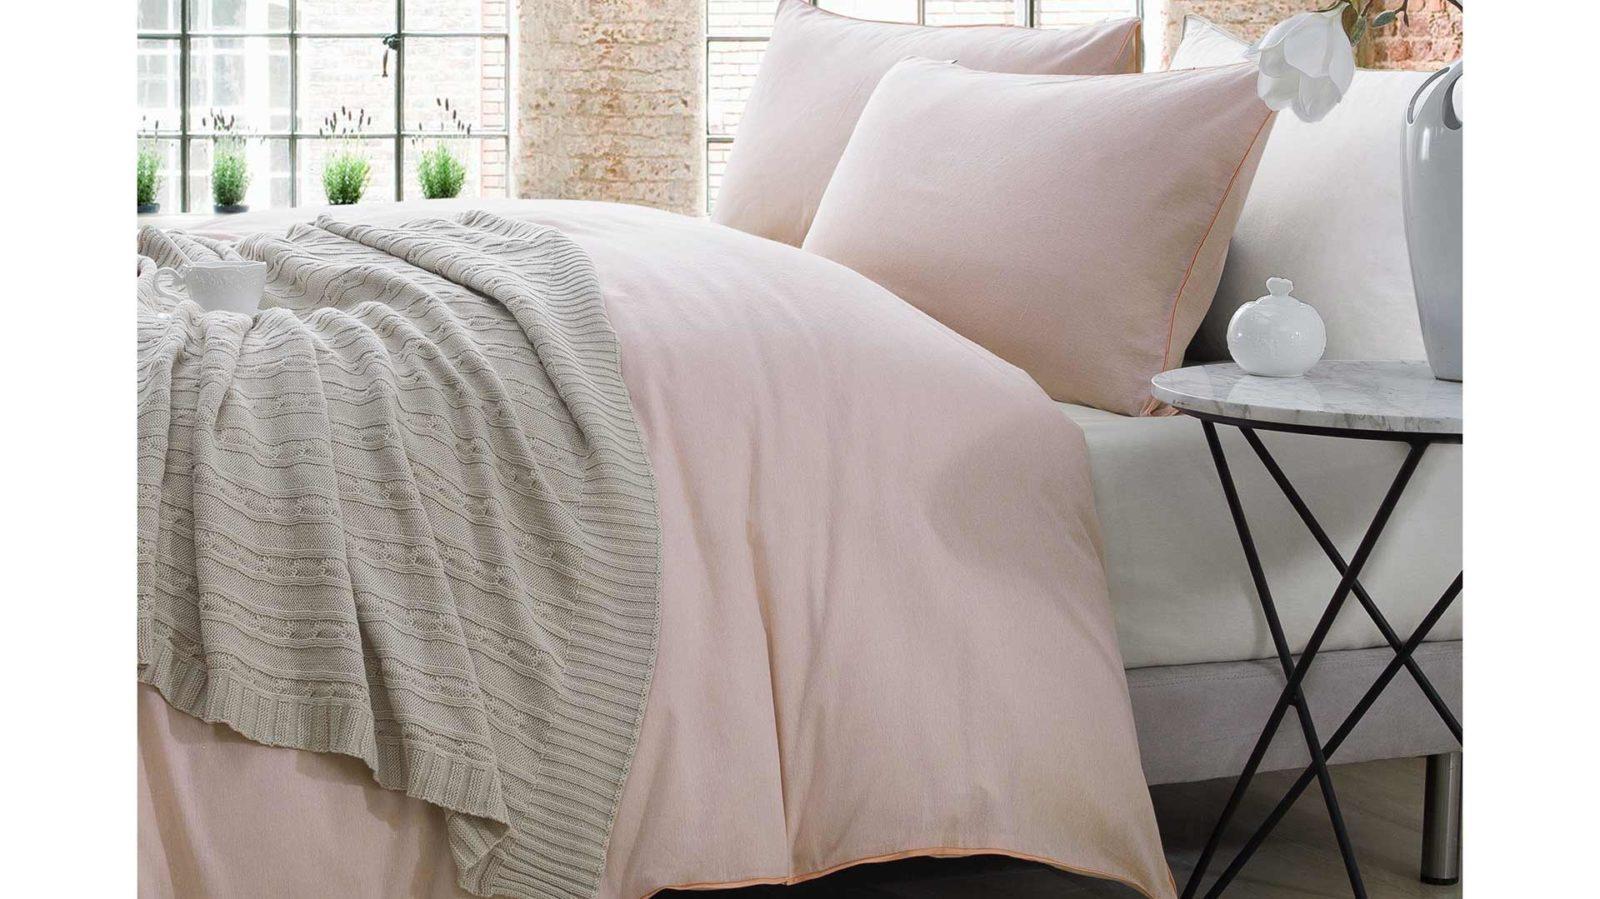 Chambray-bedding-Peach-plain-main-shot